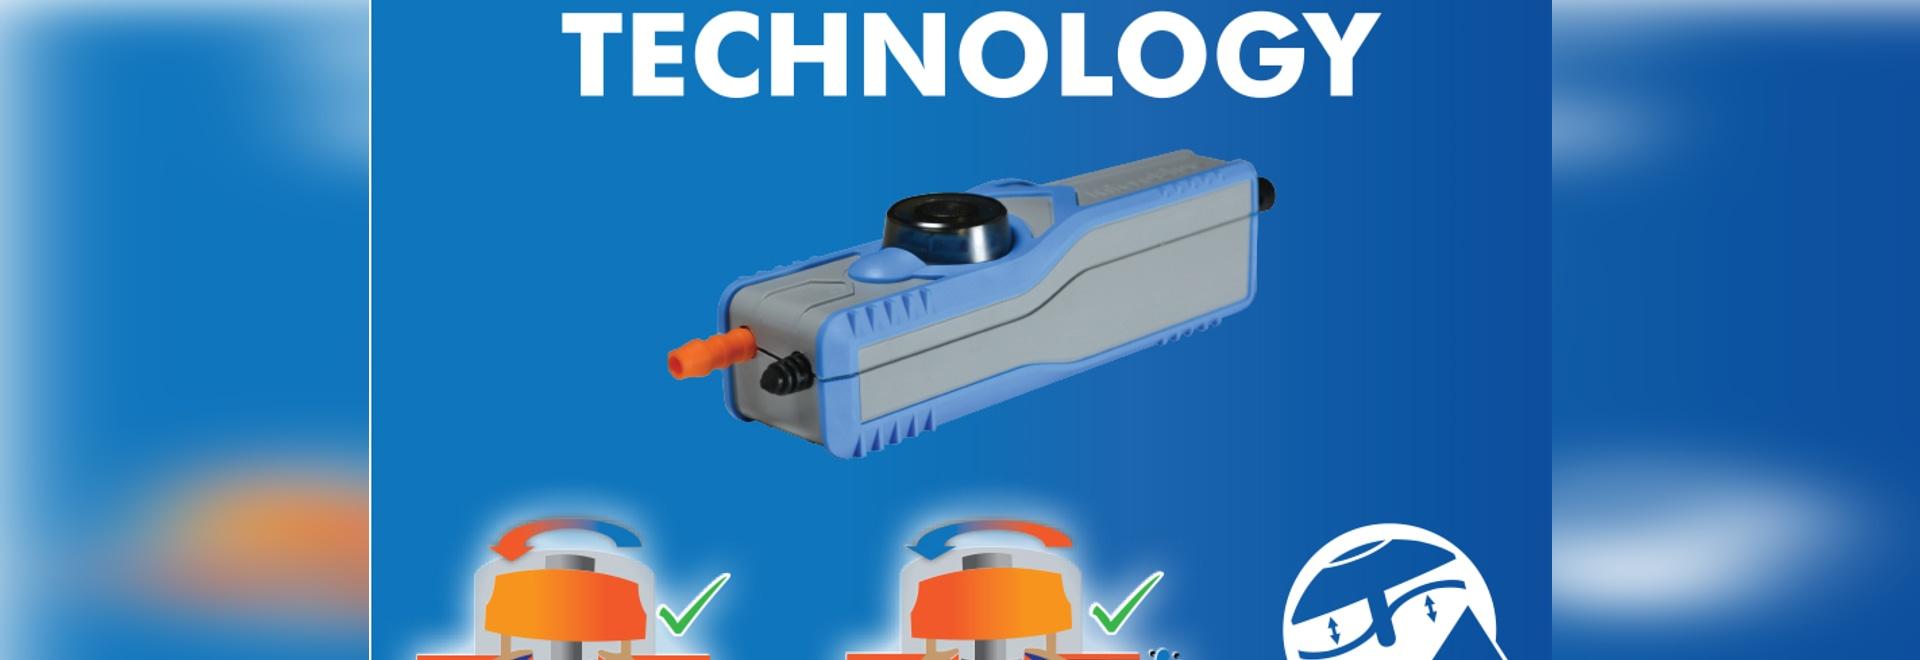 NEW Bluediamond® GyRok™ technology